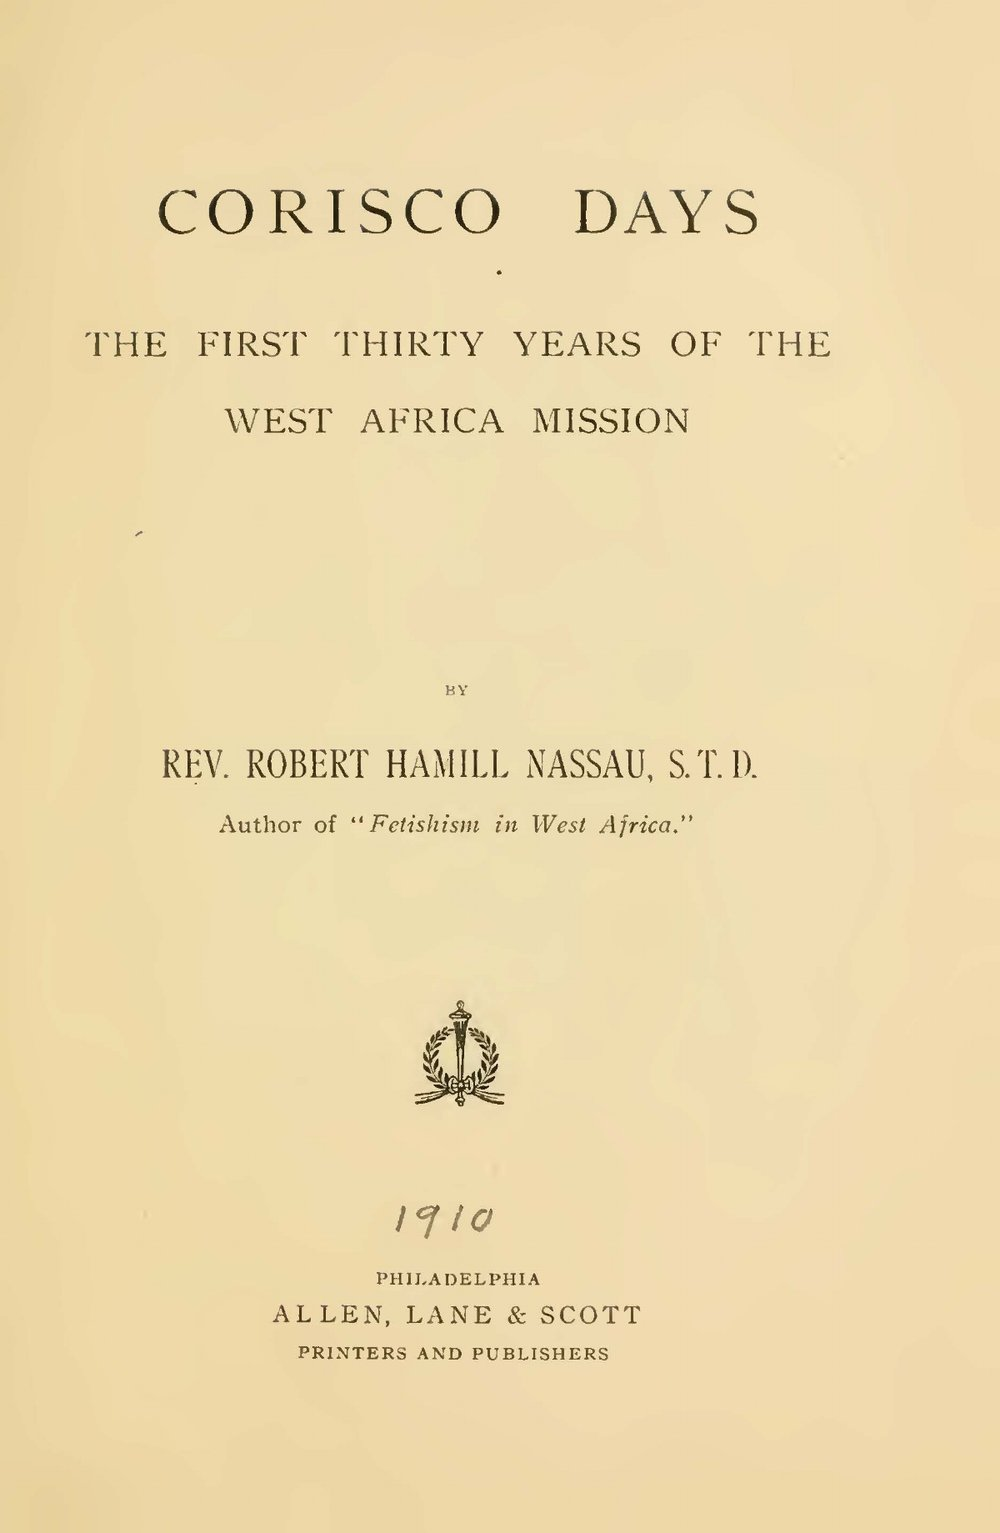 Nassau, Robert Hamill, Corisco Days Title Page.jpg